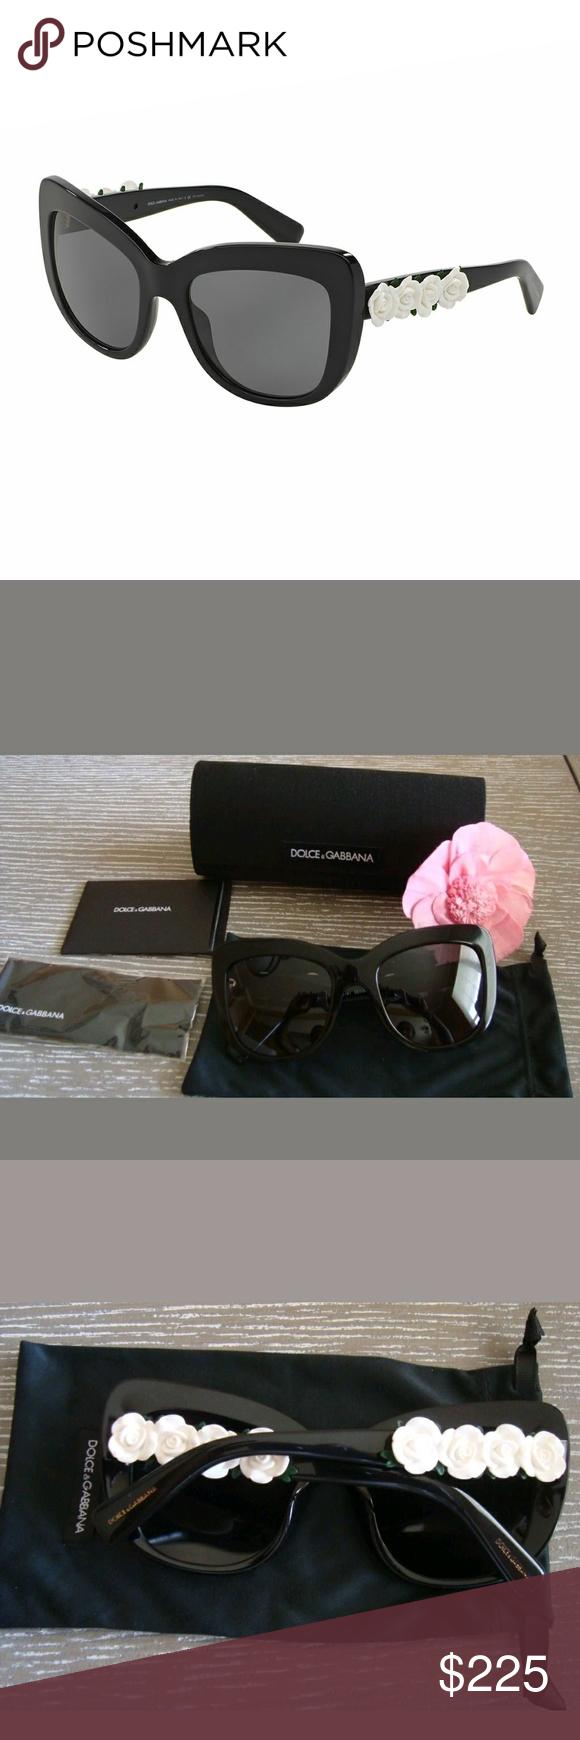 c73f5191cbfe Dolce & Gabbana Catwalk Roses Polarized Sunglasses DOLCE & GABBANA  Sunglasses DG 4252 921/81 Black 55MM Brand new authentic DOLCE & GABBANA  Sunglasses in ...